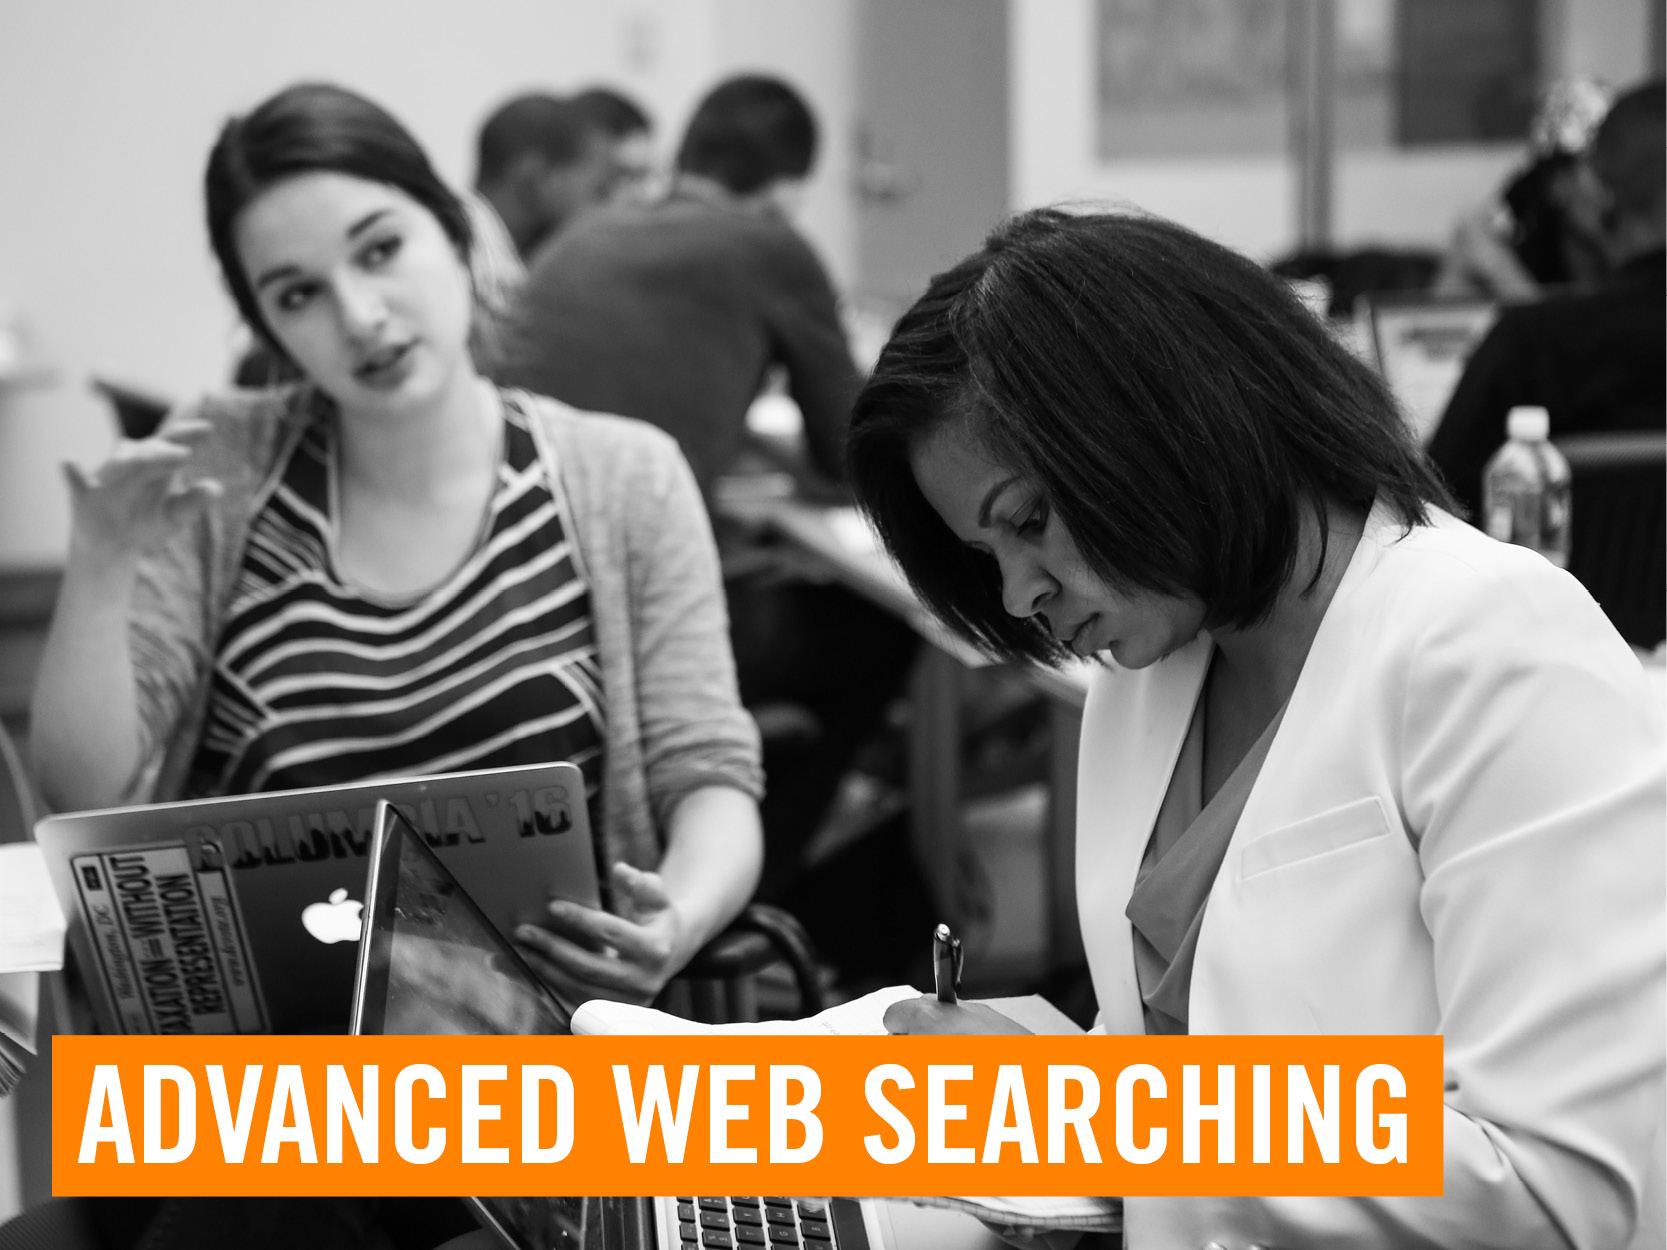 Advanced Web Searching